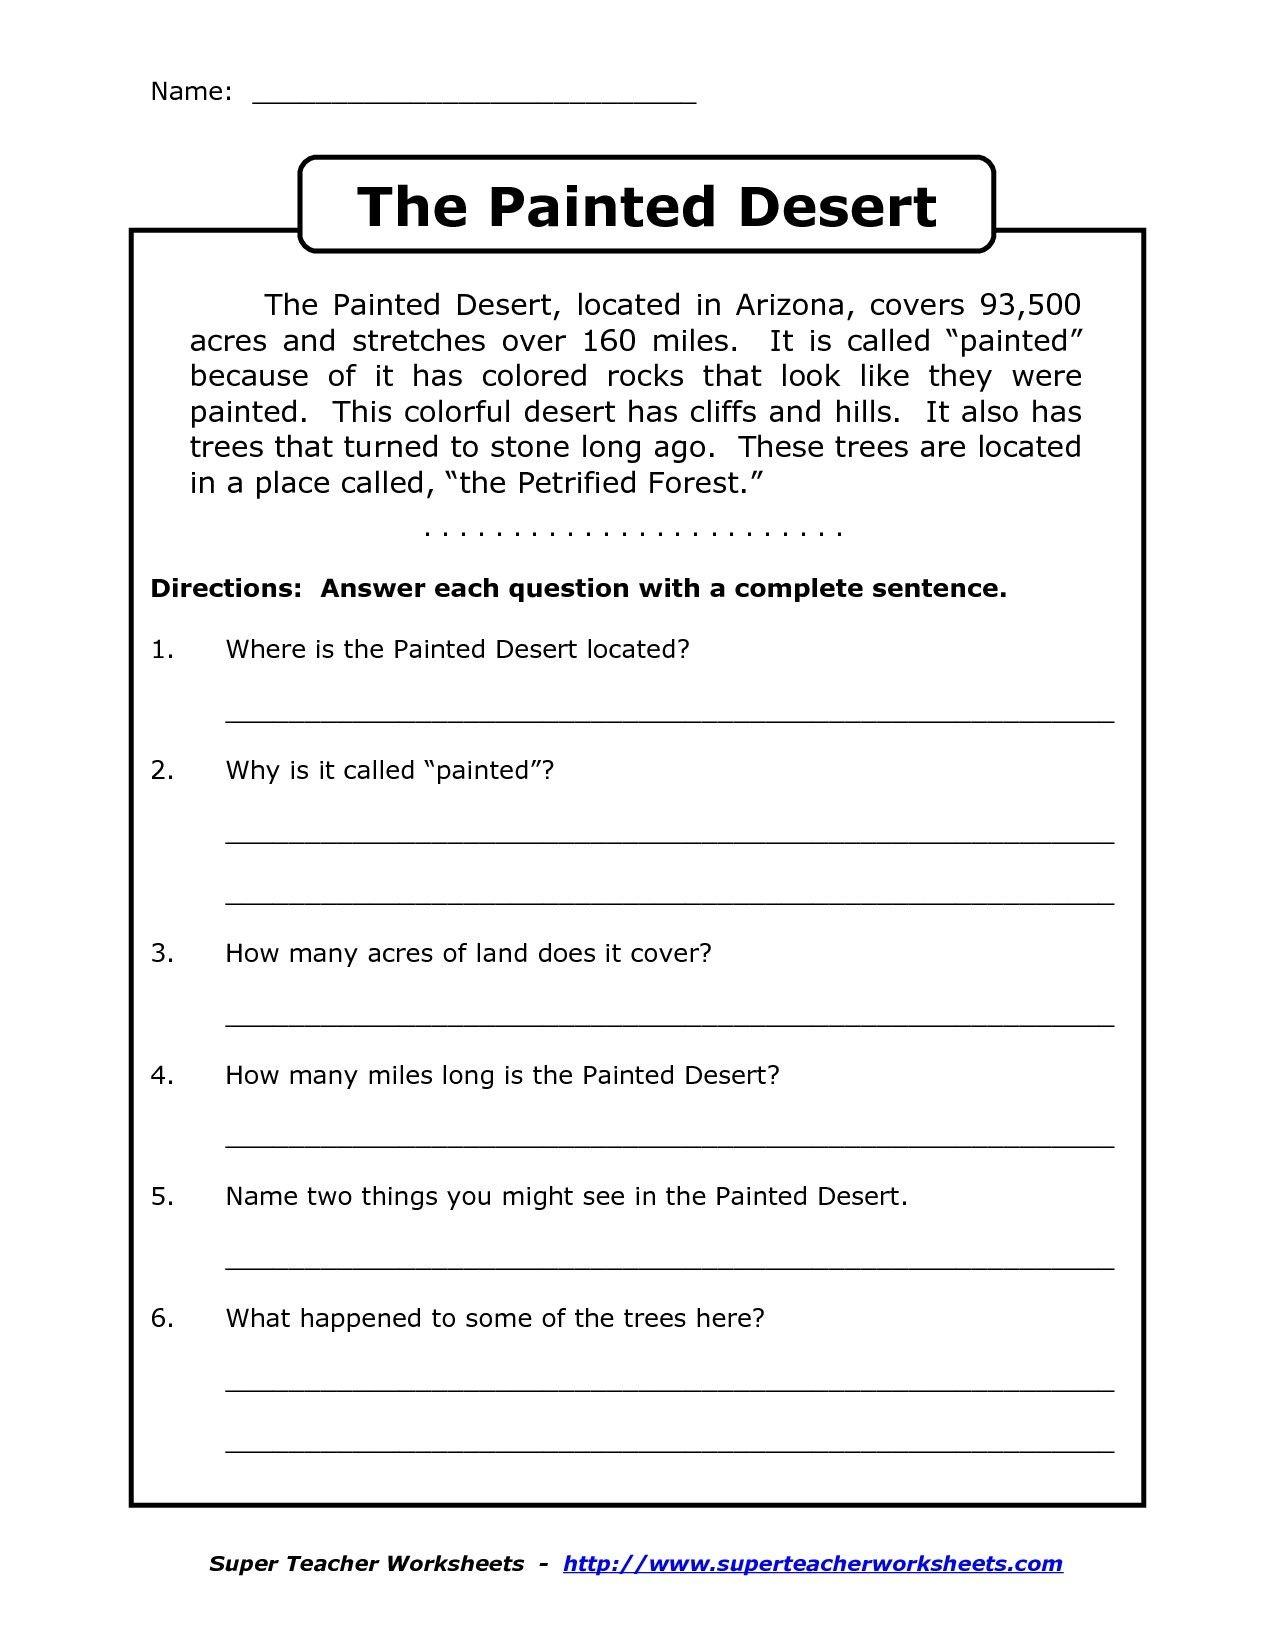 Image Result For Free Printable Worksheets For Grade 4 Comprehension - Free Printable Hindi Comprehension Worksheets For Grade 3